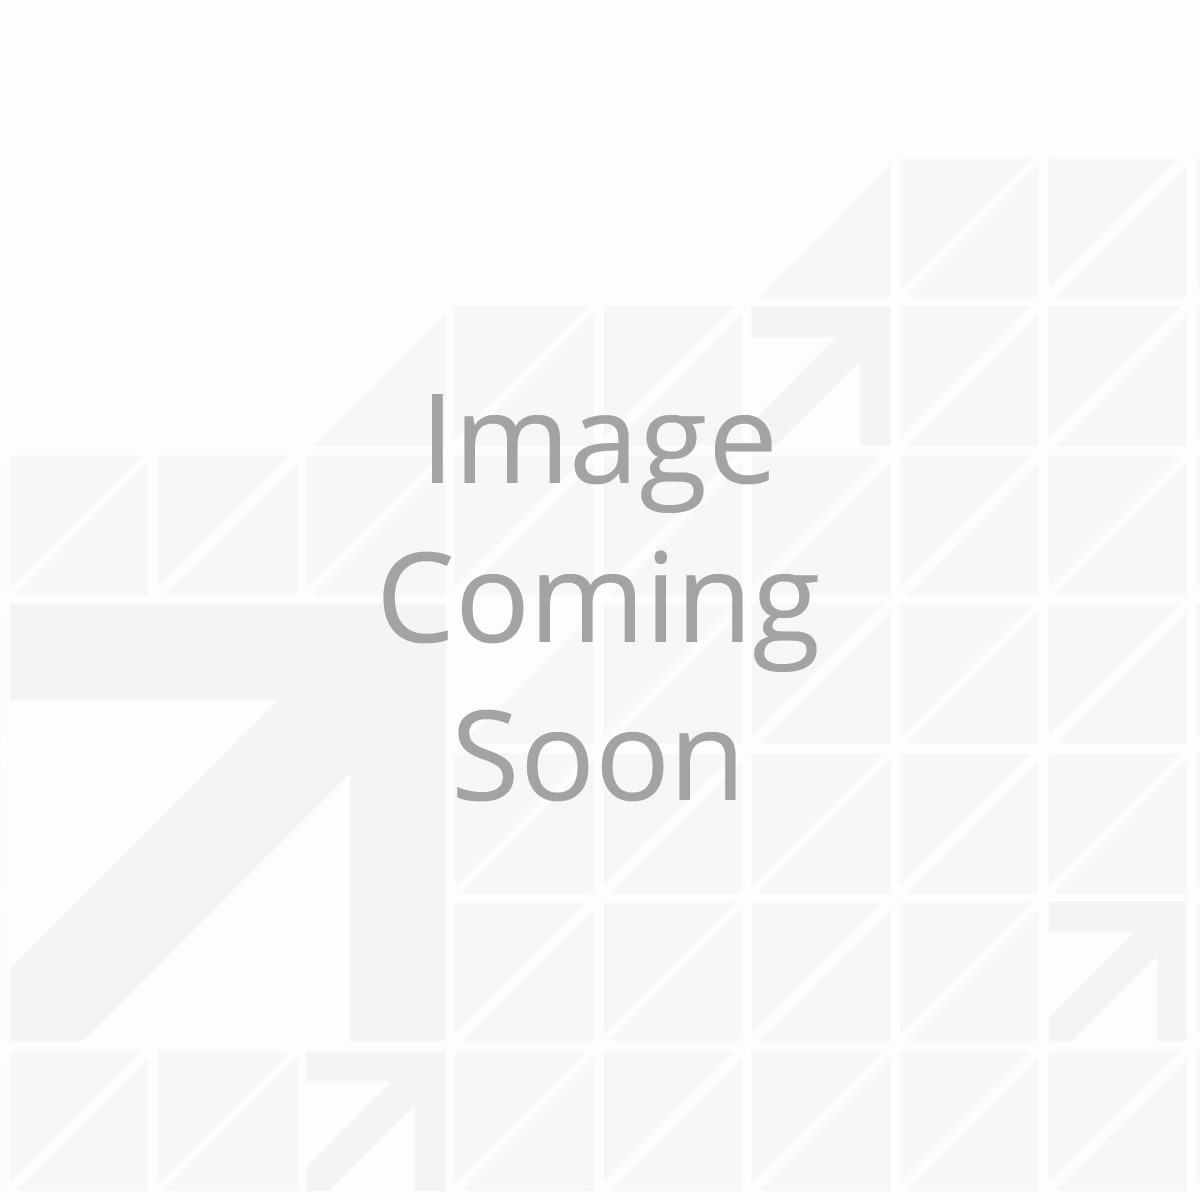 LCI Black and White Hat